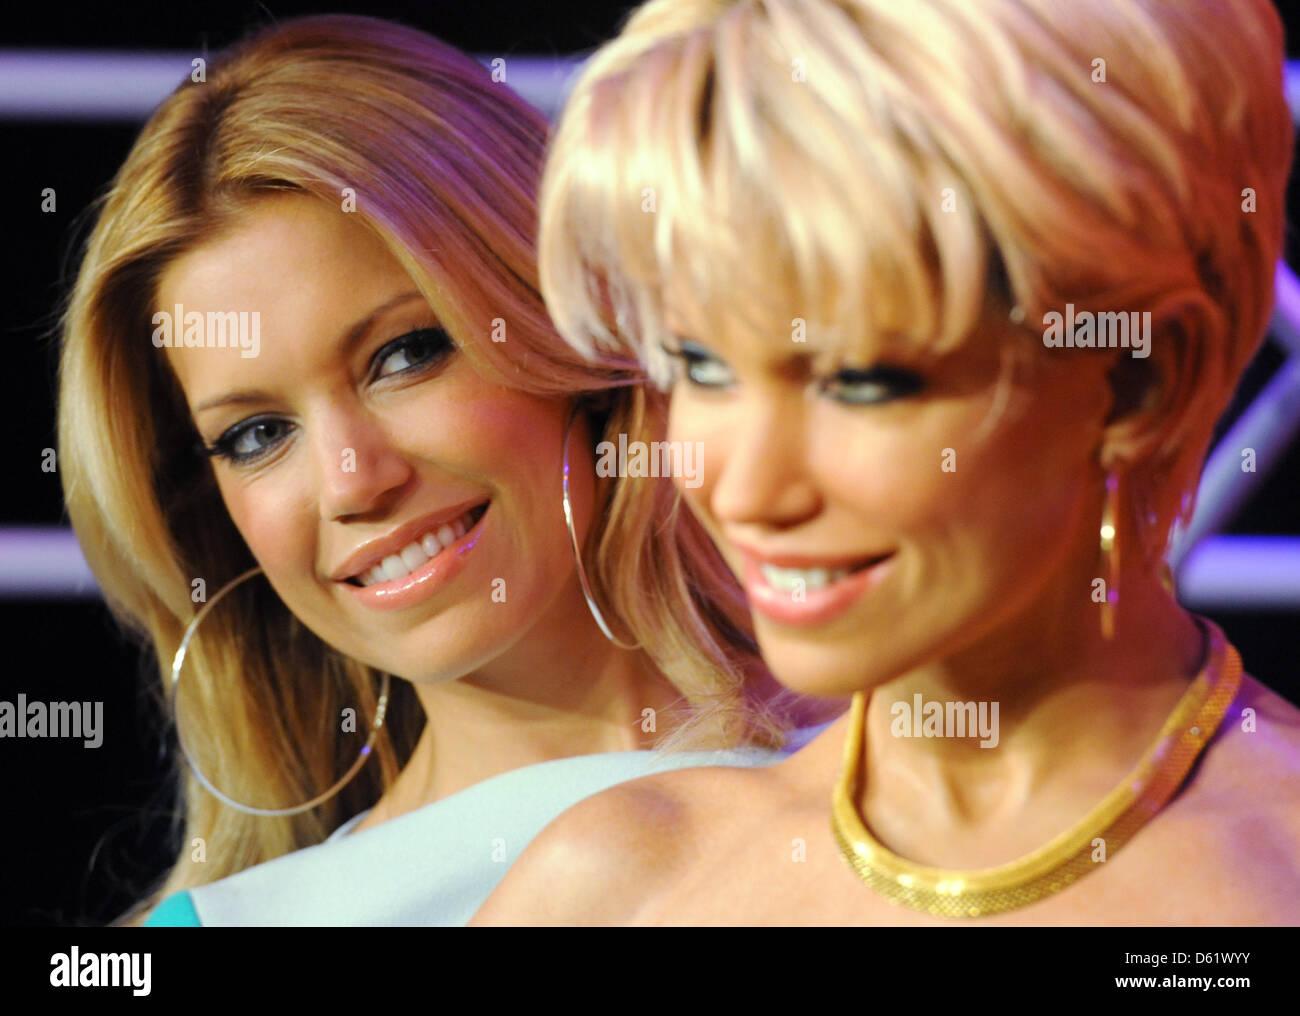 TVpersonality and model Sylvie van der Vaart (L) presents her wax likeness at Madame Tussaud's in Berlin, - Stock Image